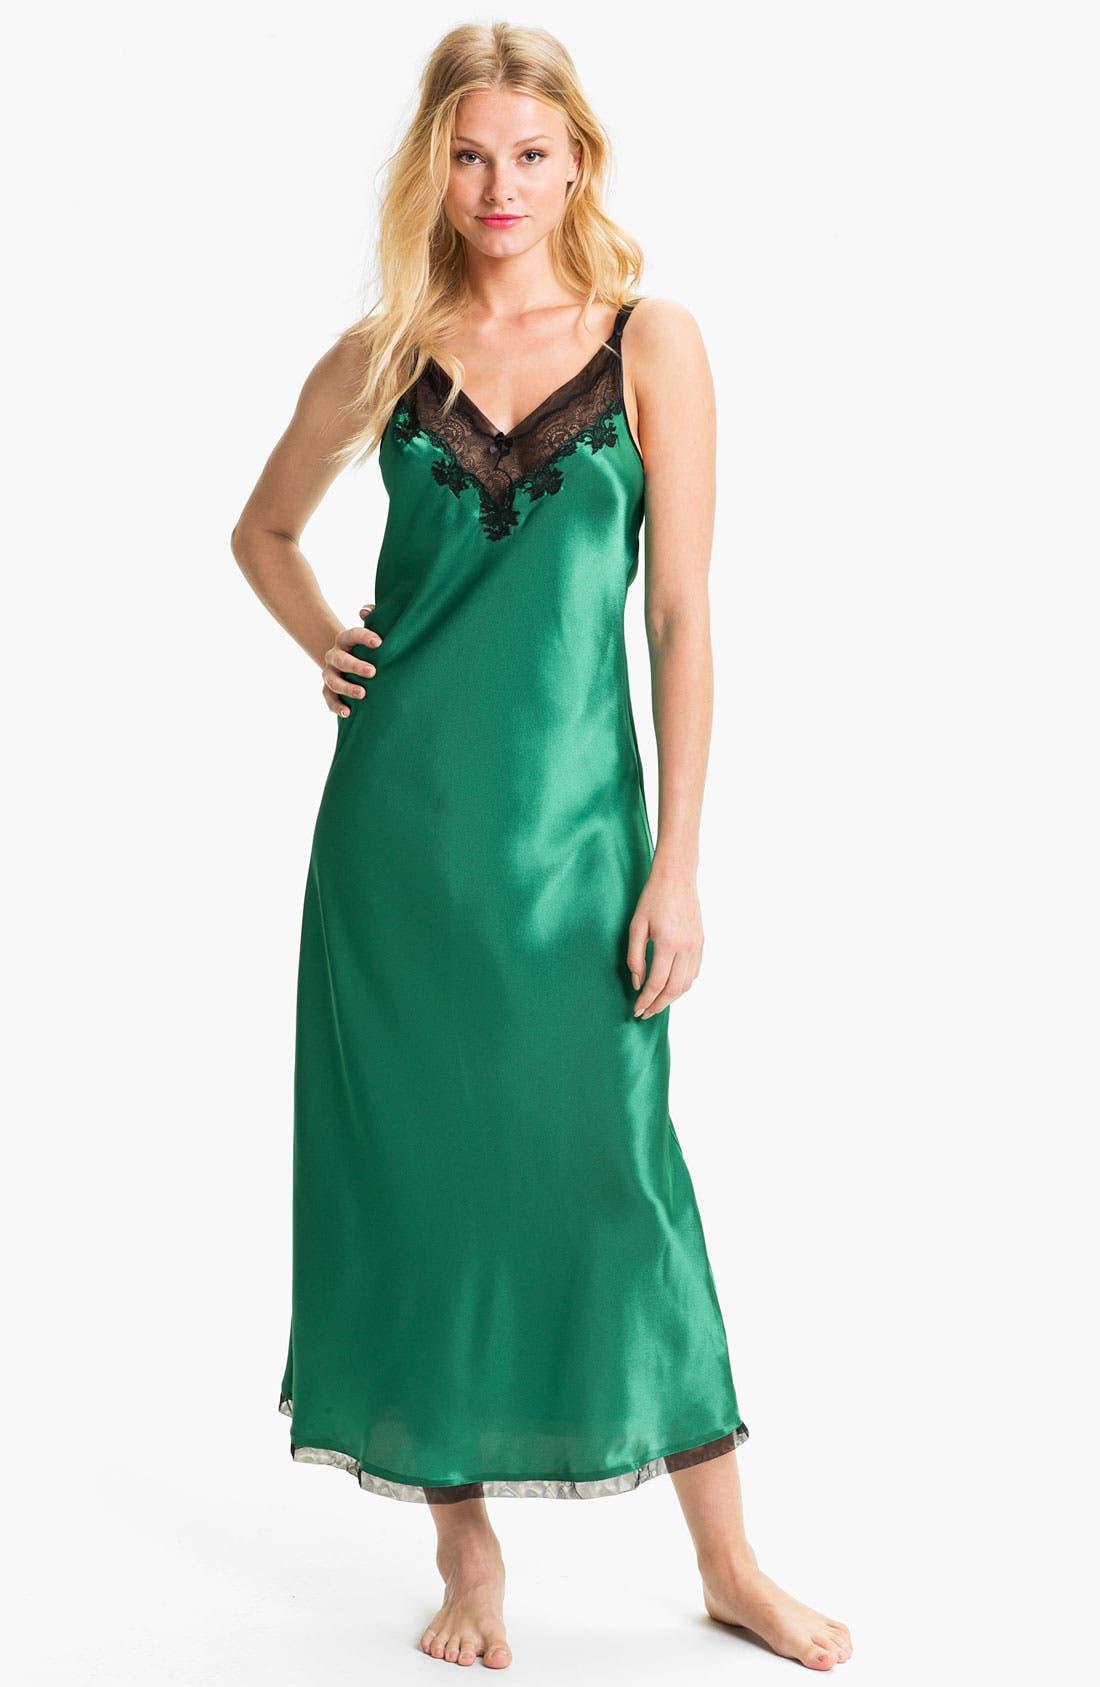 Alternate Image 1 Selected - Oscar de la Renta Sleepwear Lace Trim Charmeuse Nightgown